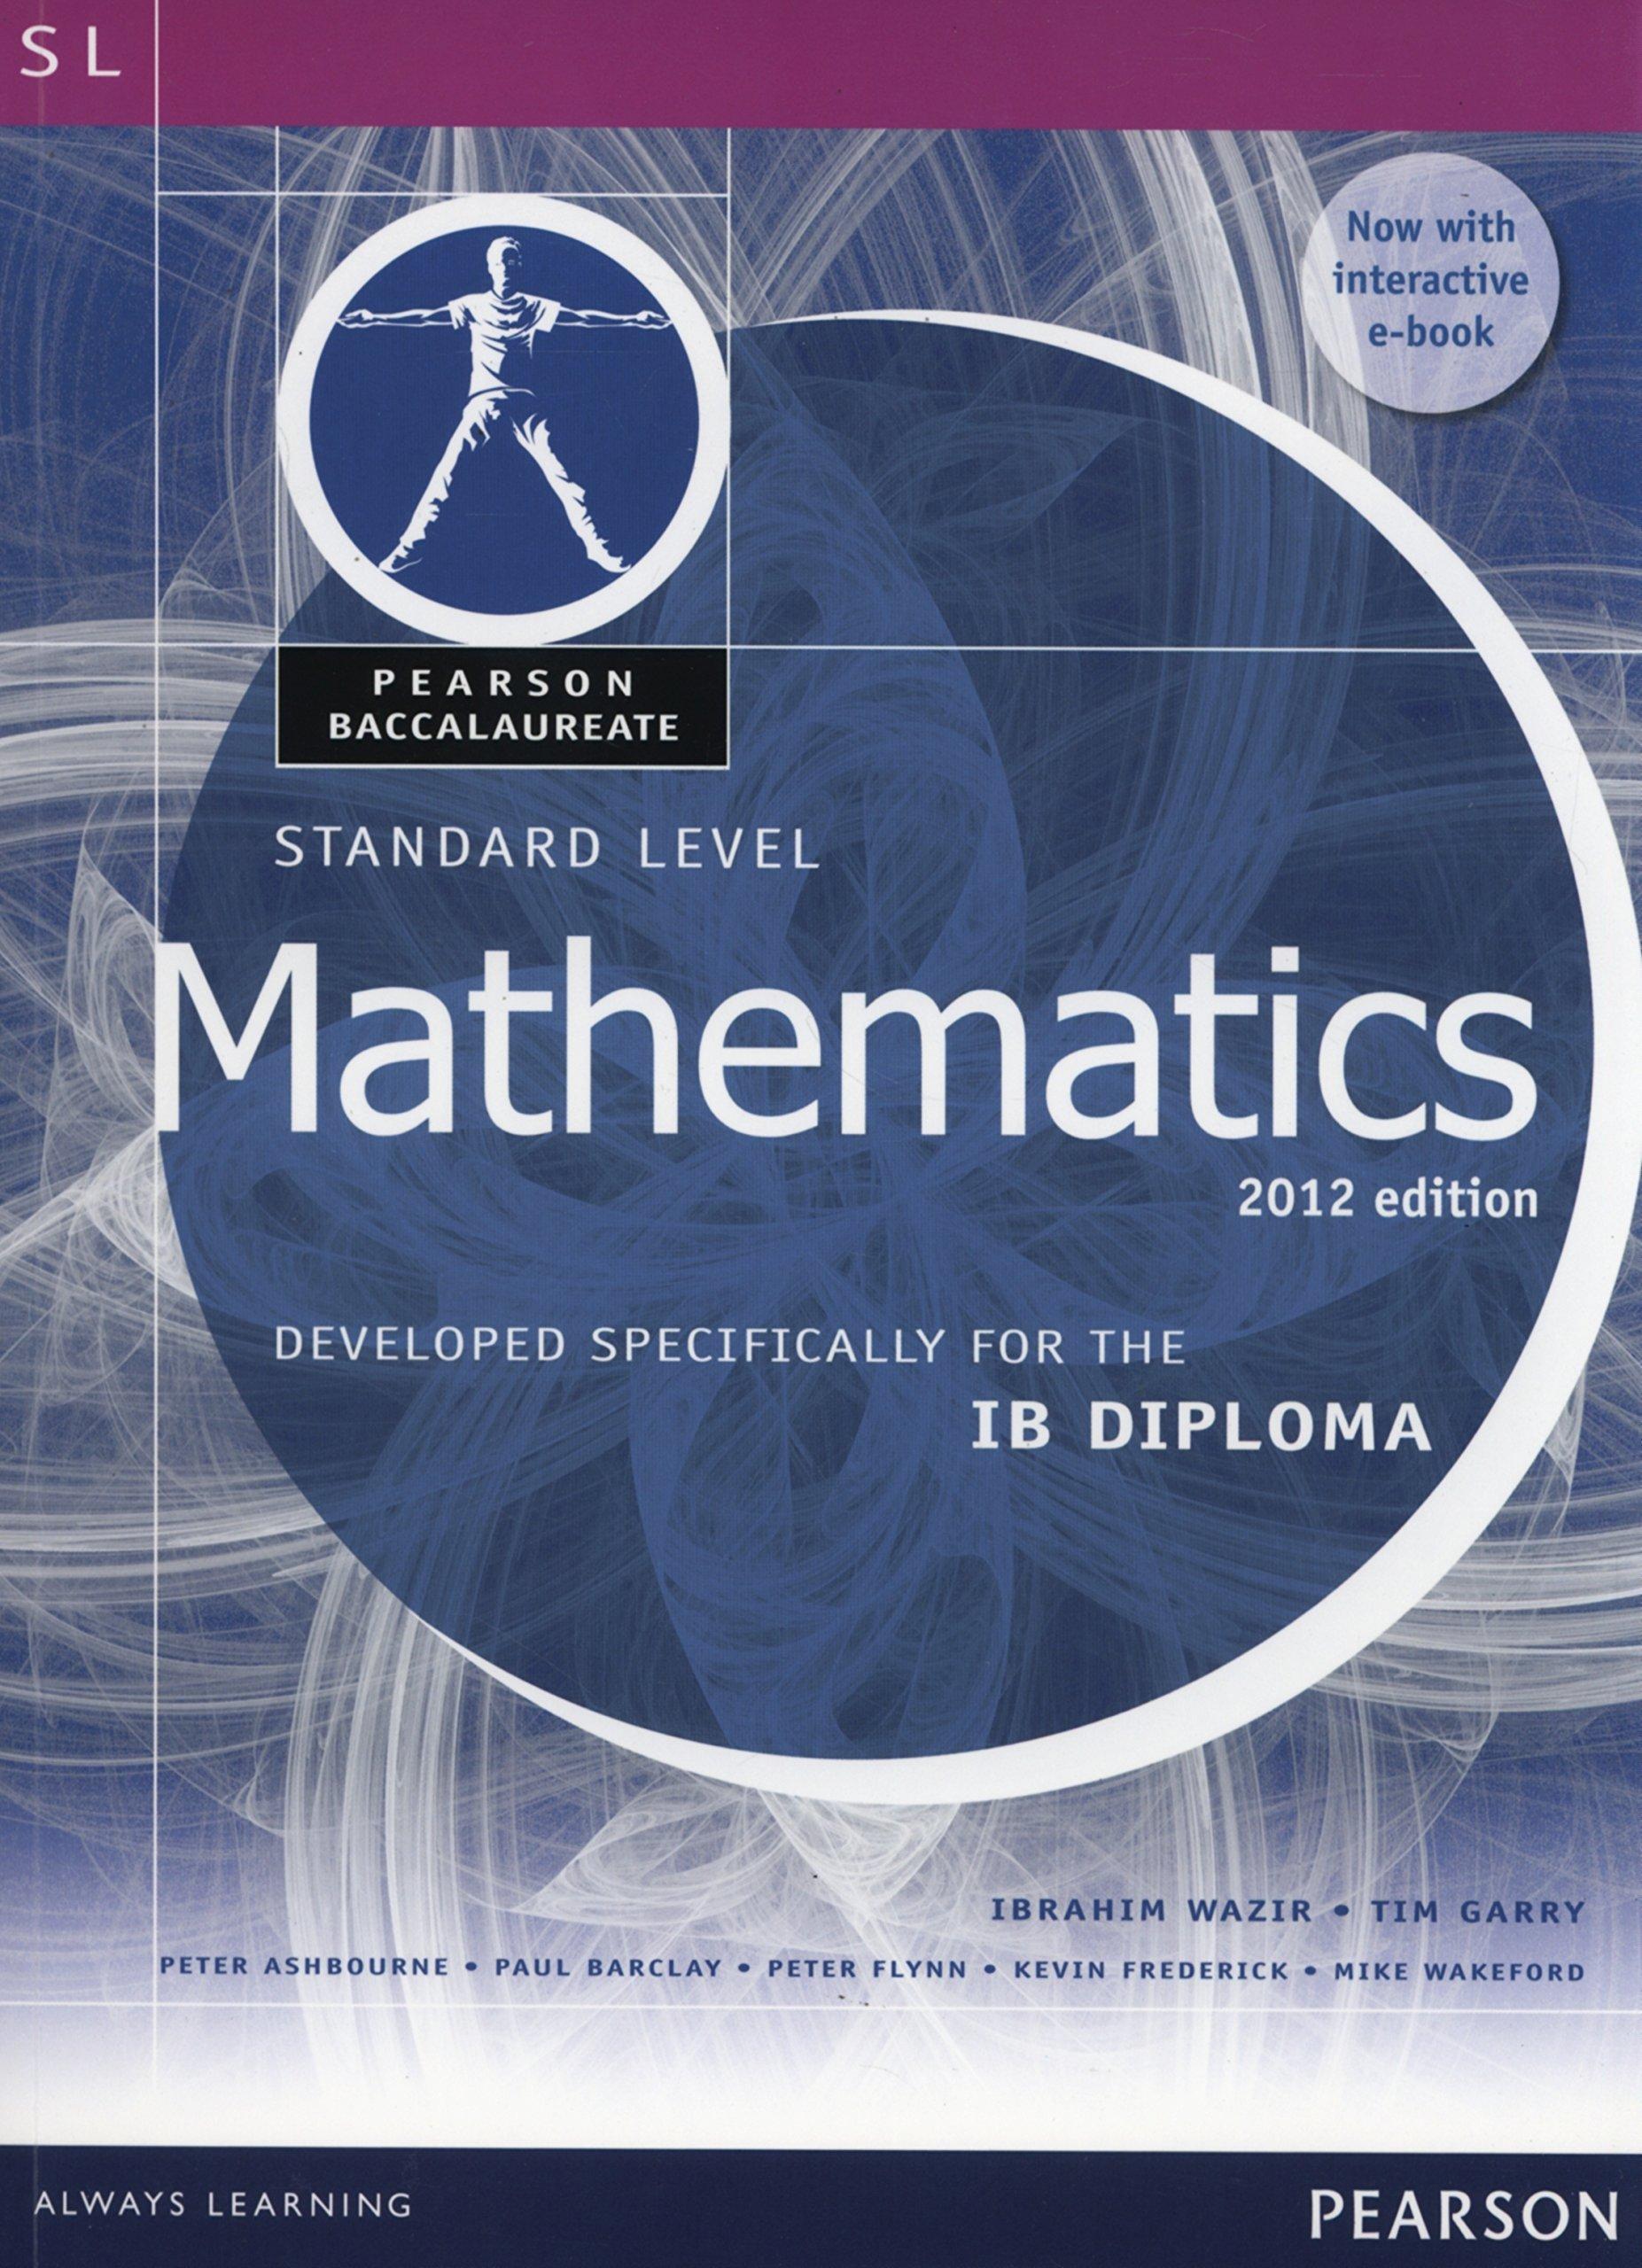 Pearson Baccalaureate Standard Level Mathematics Revised